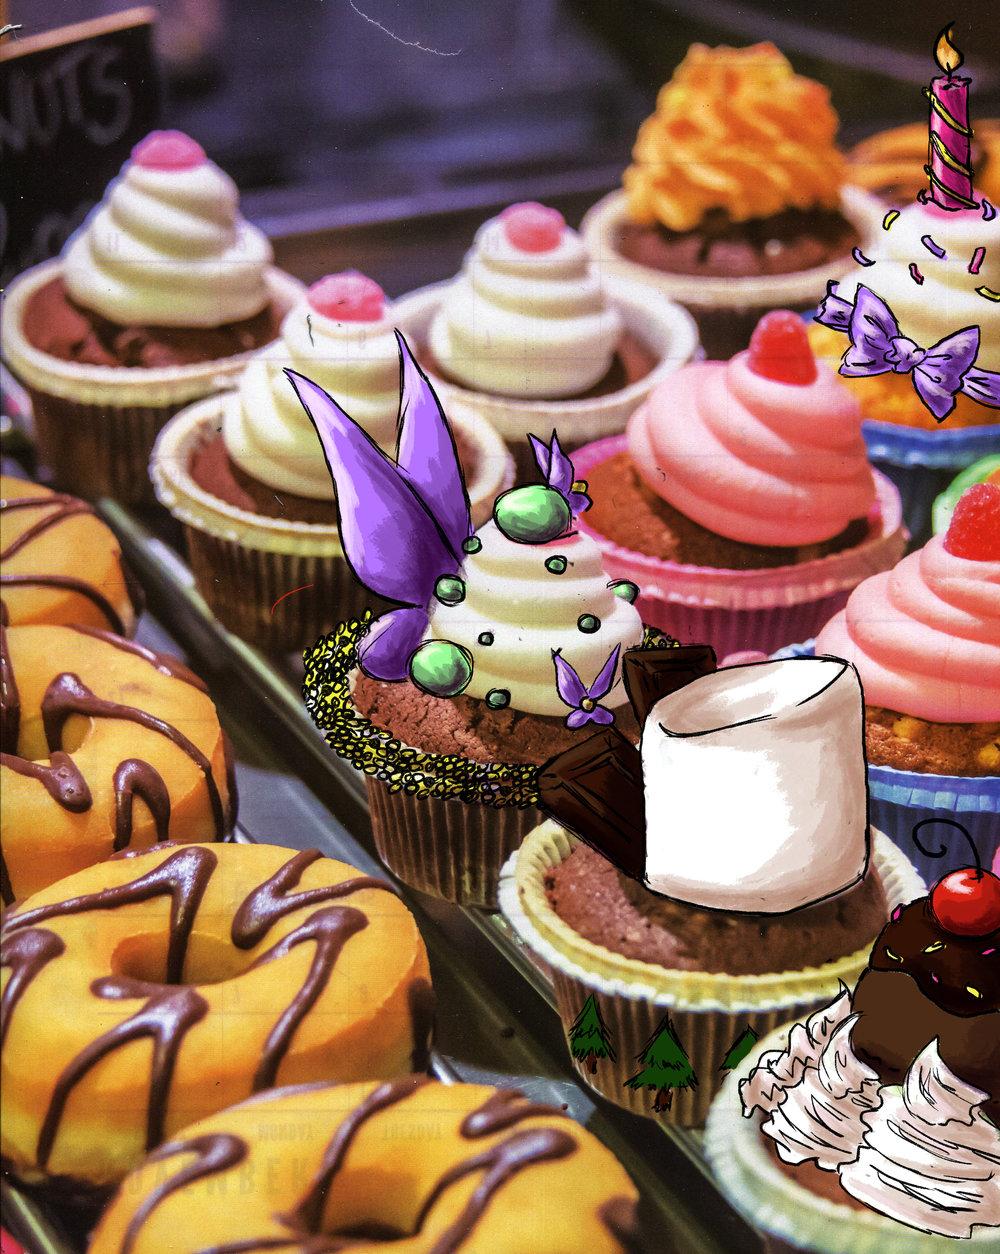 doodled cupcakes.jpg